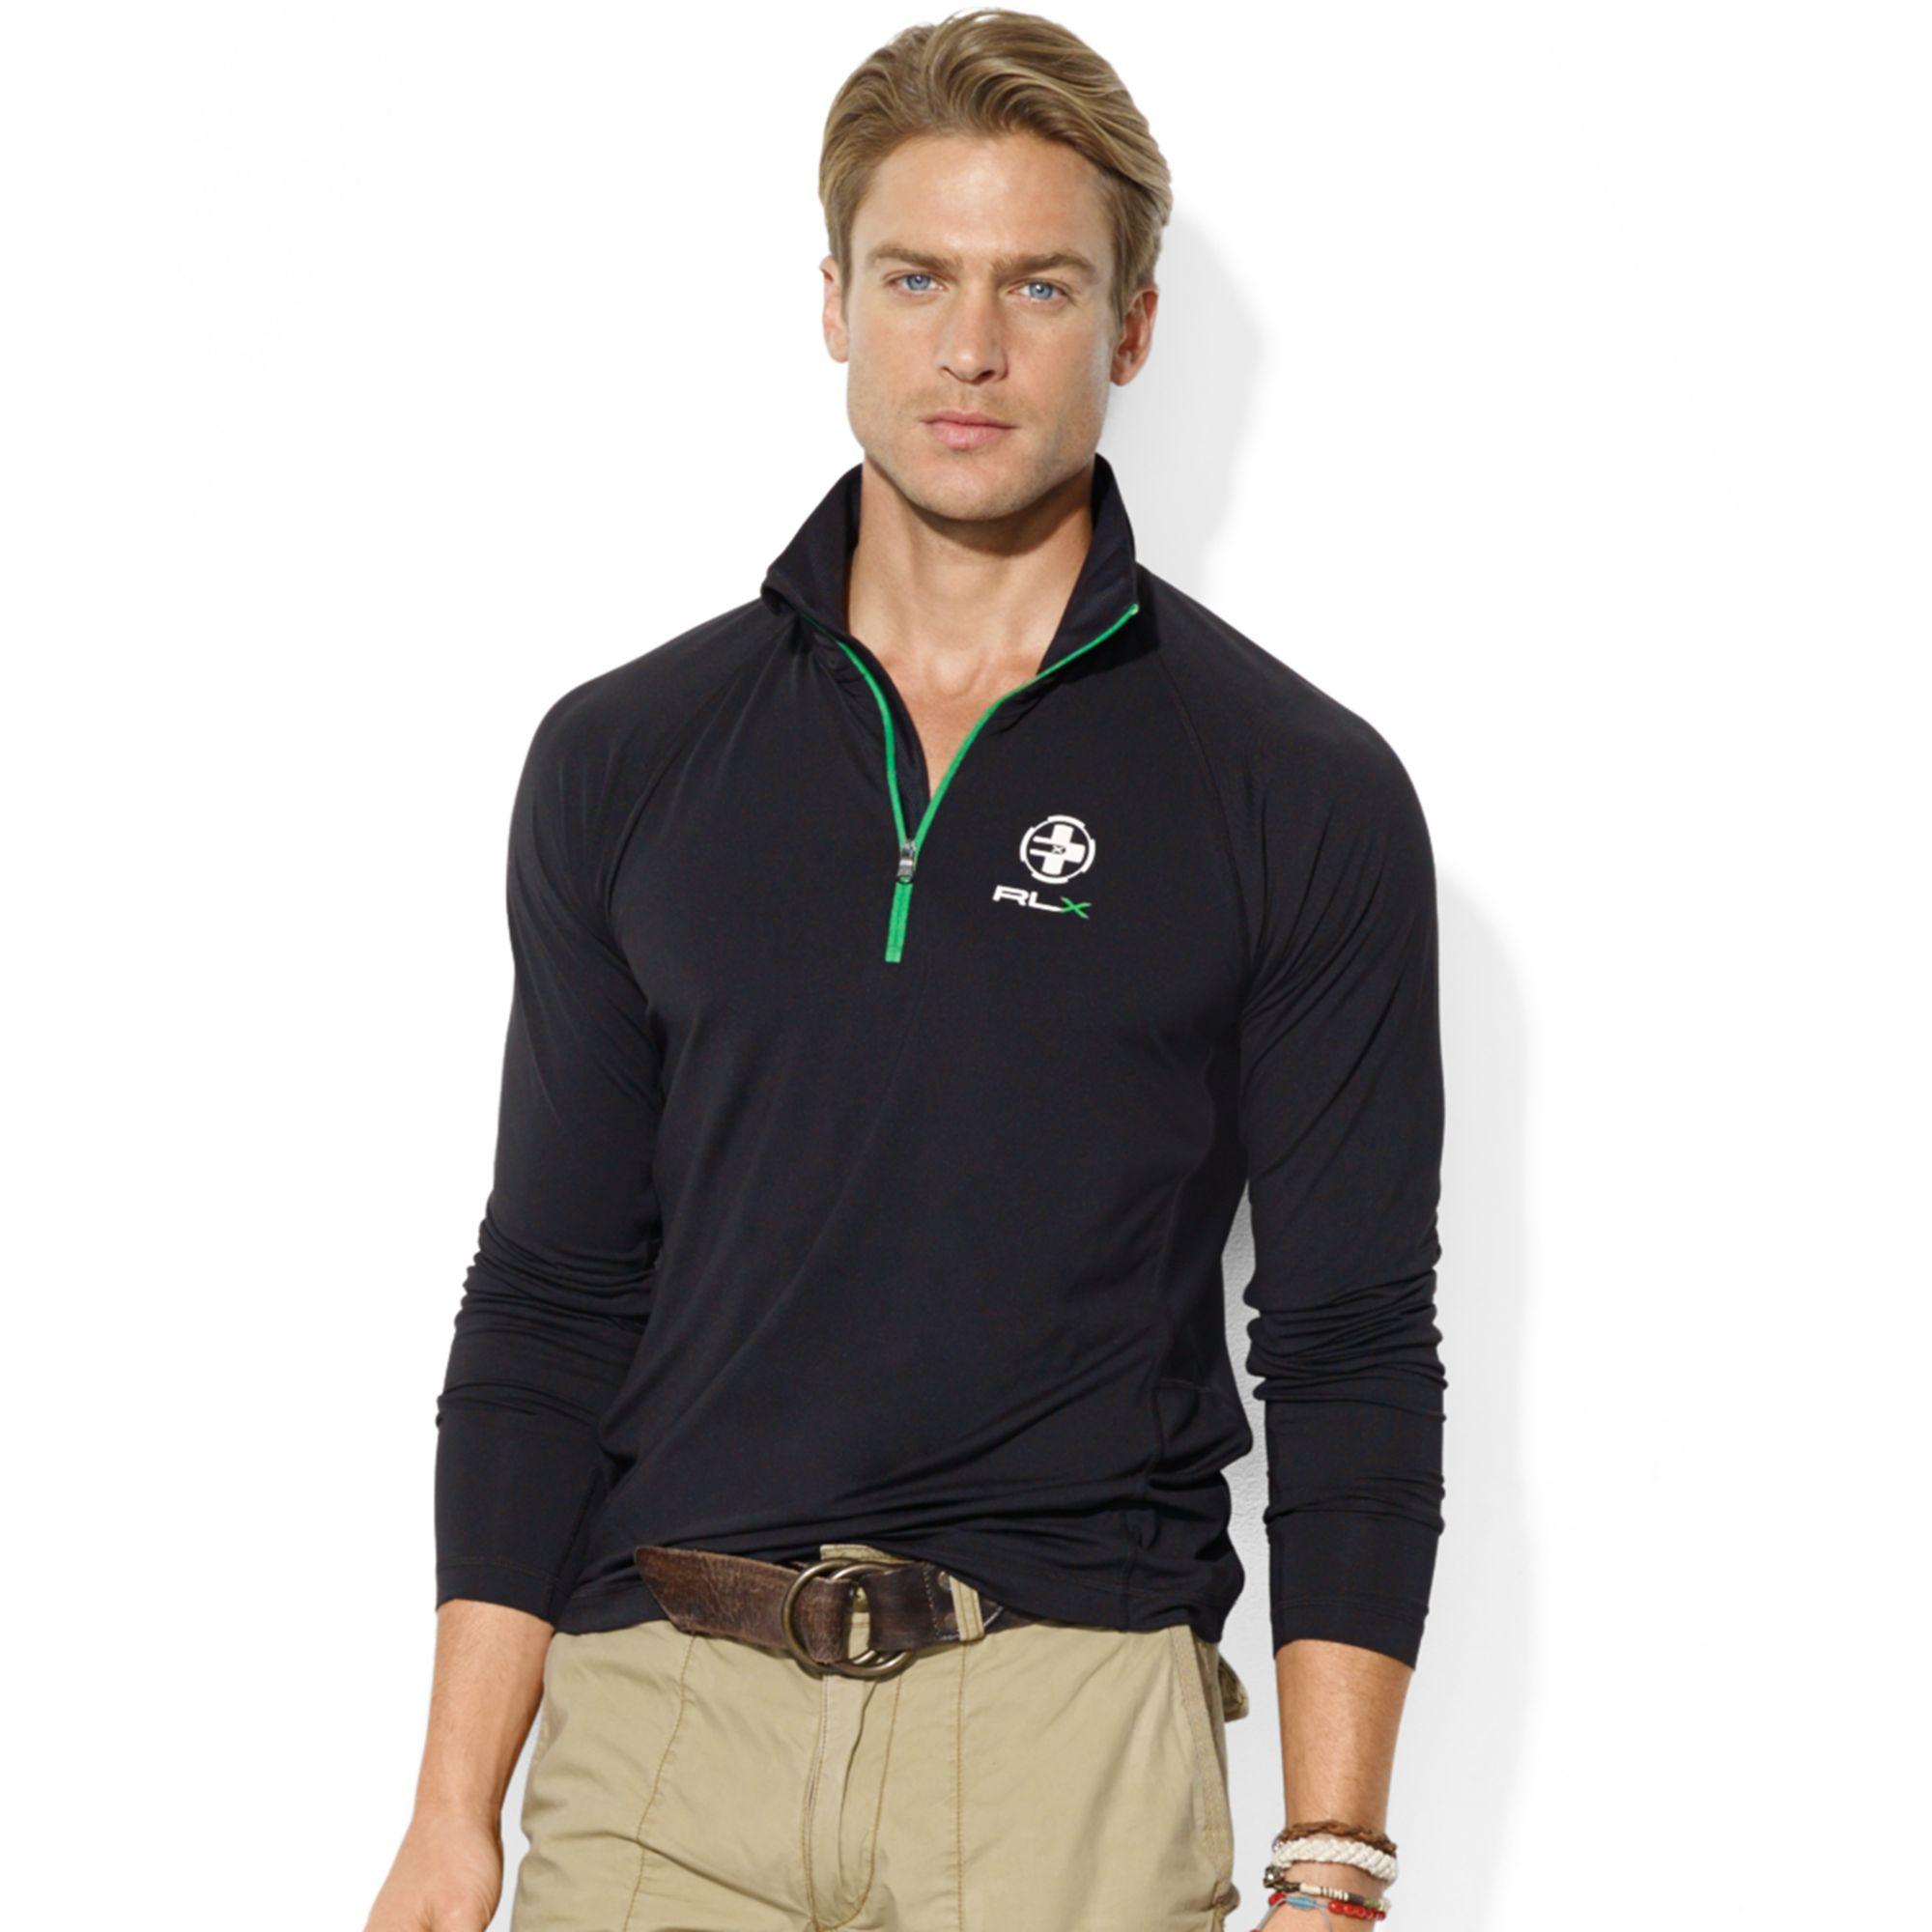 Ralph lauren Polo Rlx Halfzip Mock Neck Jersey Pullover in Black for Men (Polo Black